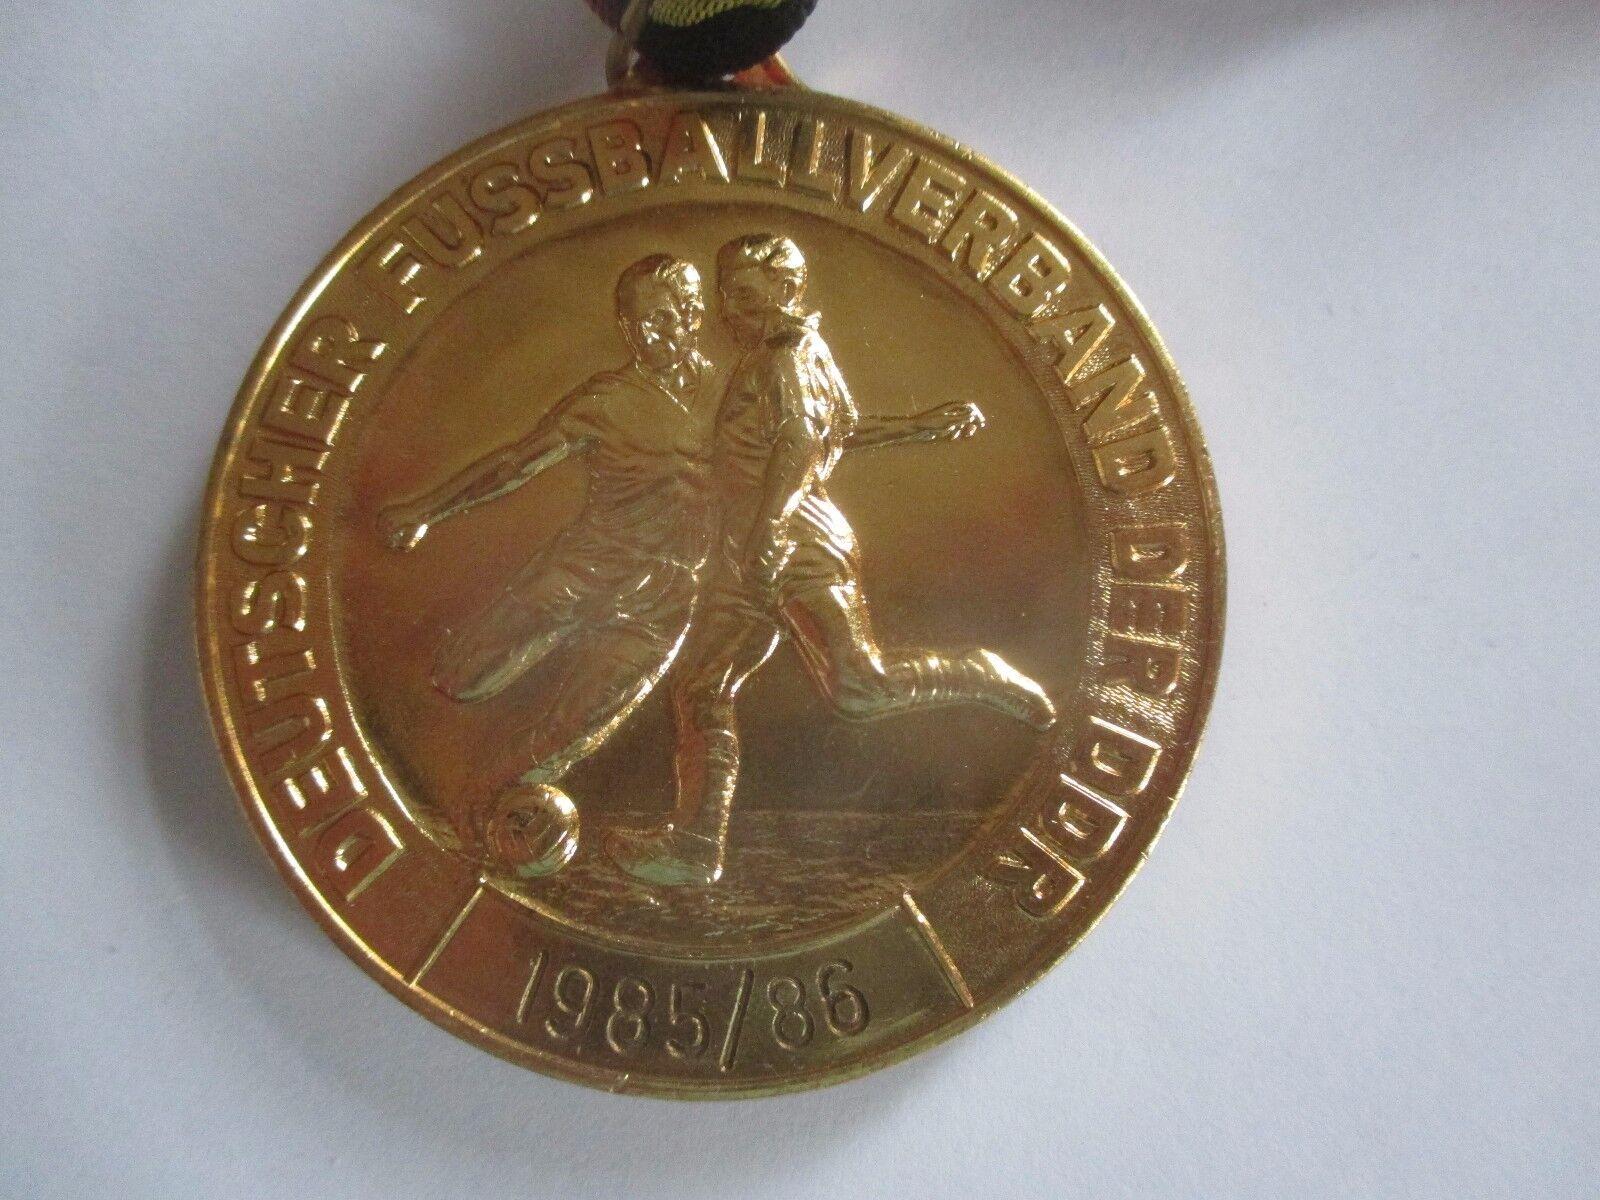 M3 JUGEND Gold MEDAILLE 1985 86 86 86 FC VORWÄRTS FRANKFURT DDR OBERLIGA Fußball DFV 481f7c